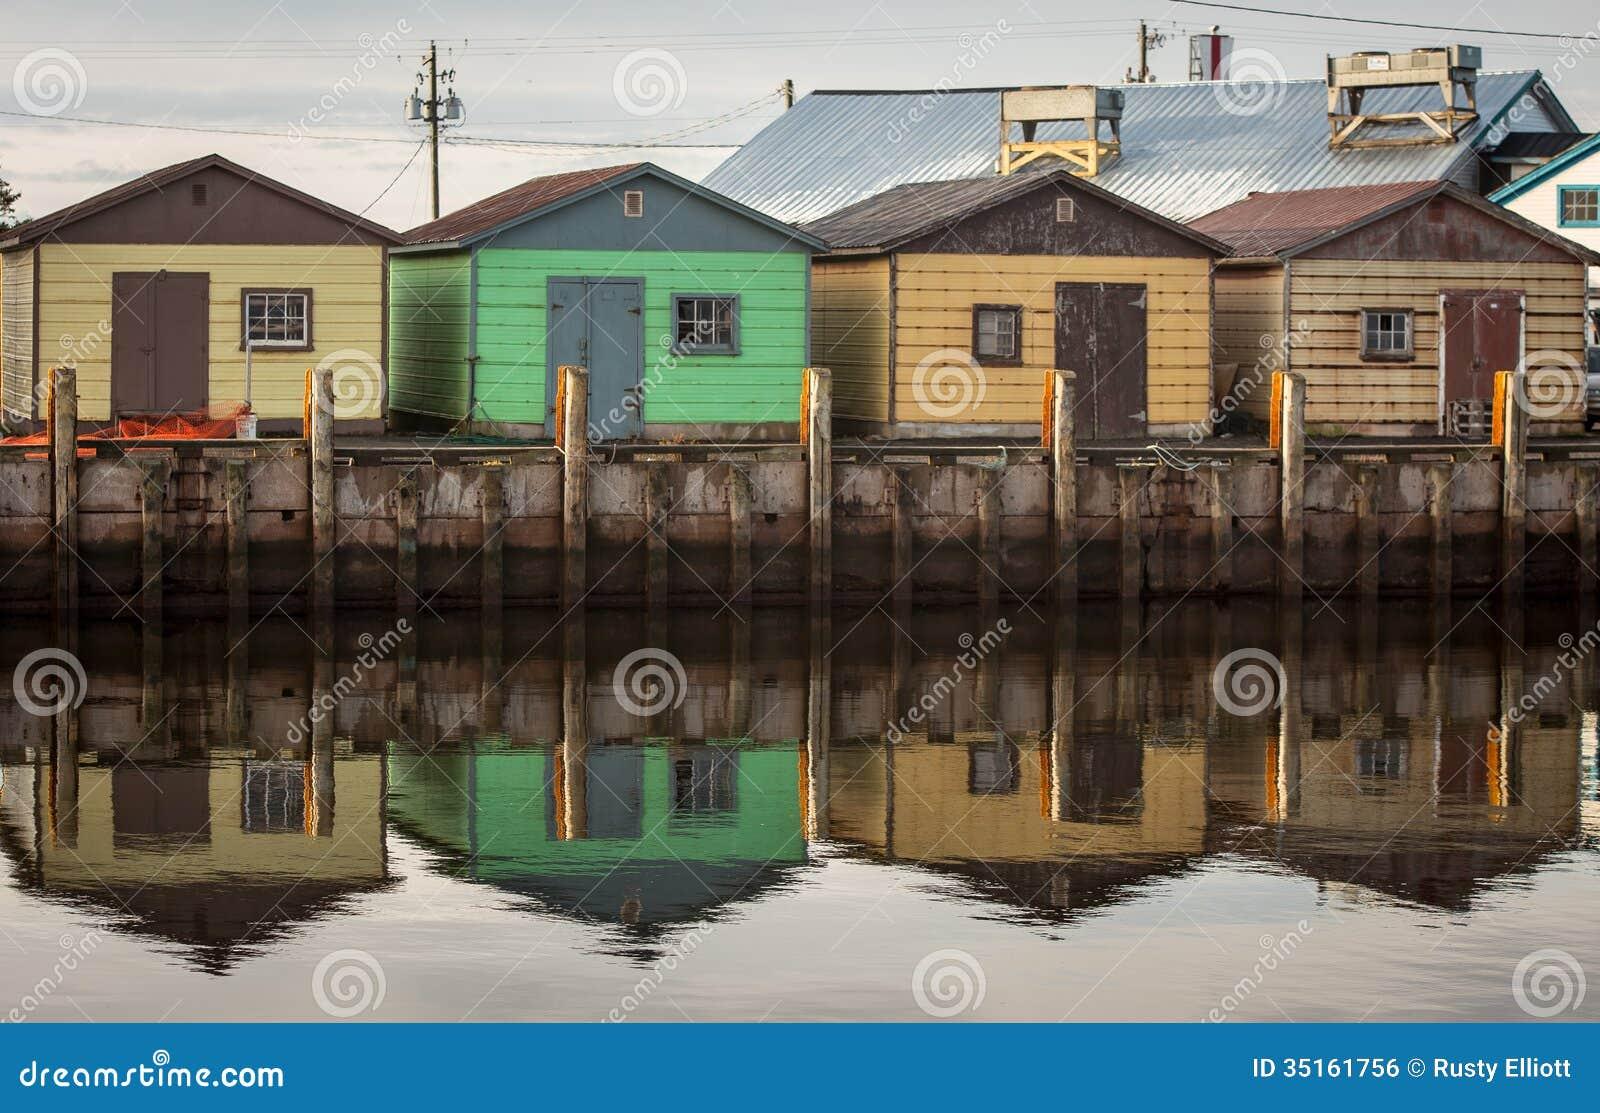 Fishing shacks stock photo image of prince canada for Too cool fishing